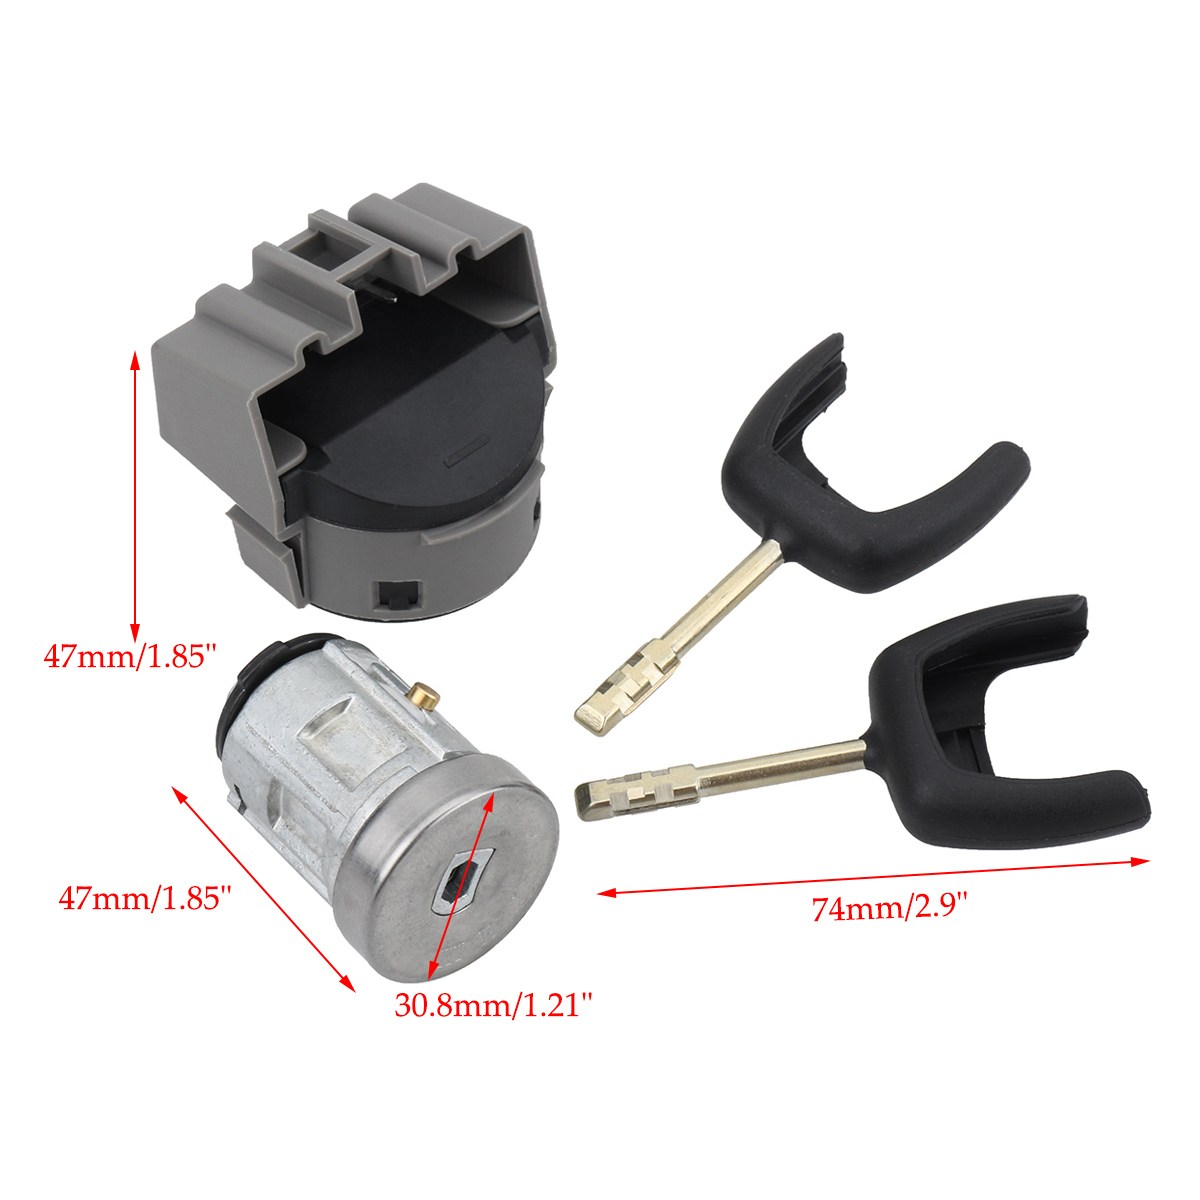 vehicle parts accessories brand new starter ignition switch wiring ford transit mk3 mk4 mk5 1985 2000 [ 1200 x 1200 Pixel ]